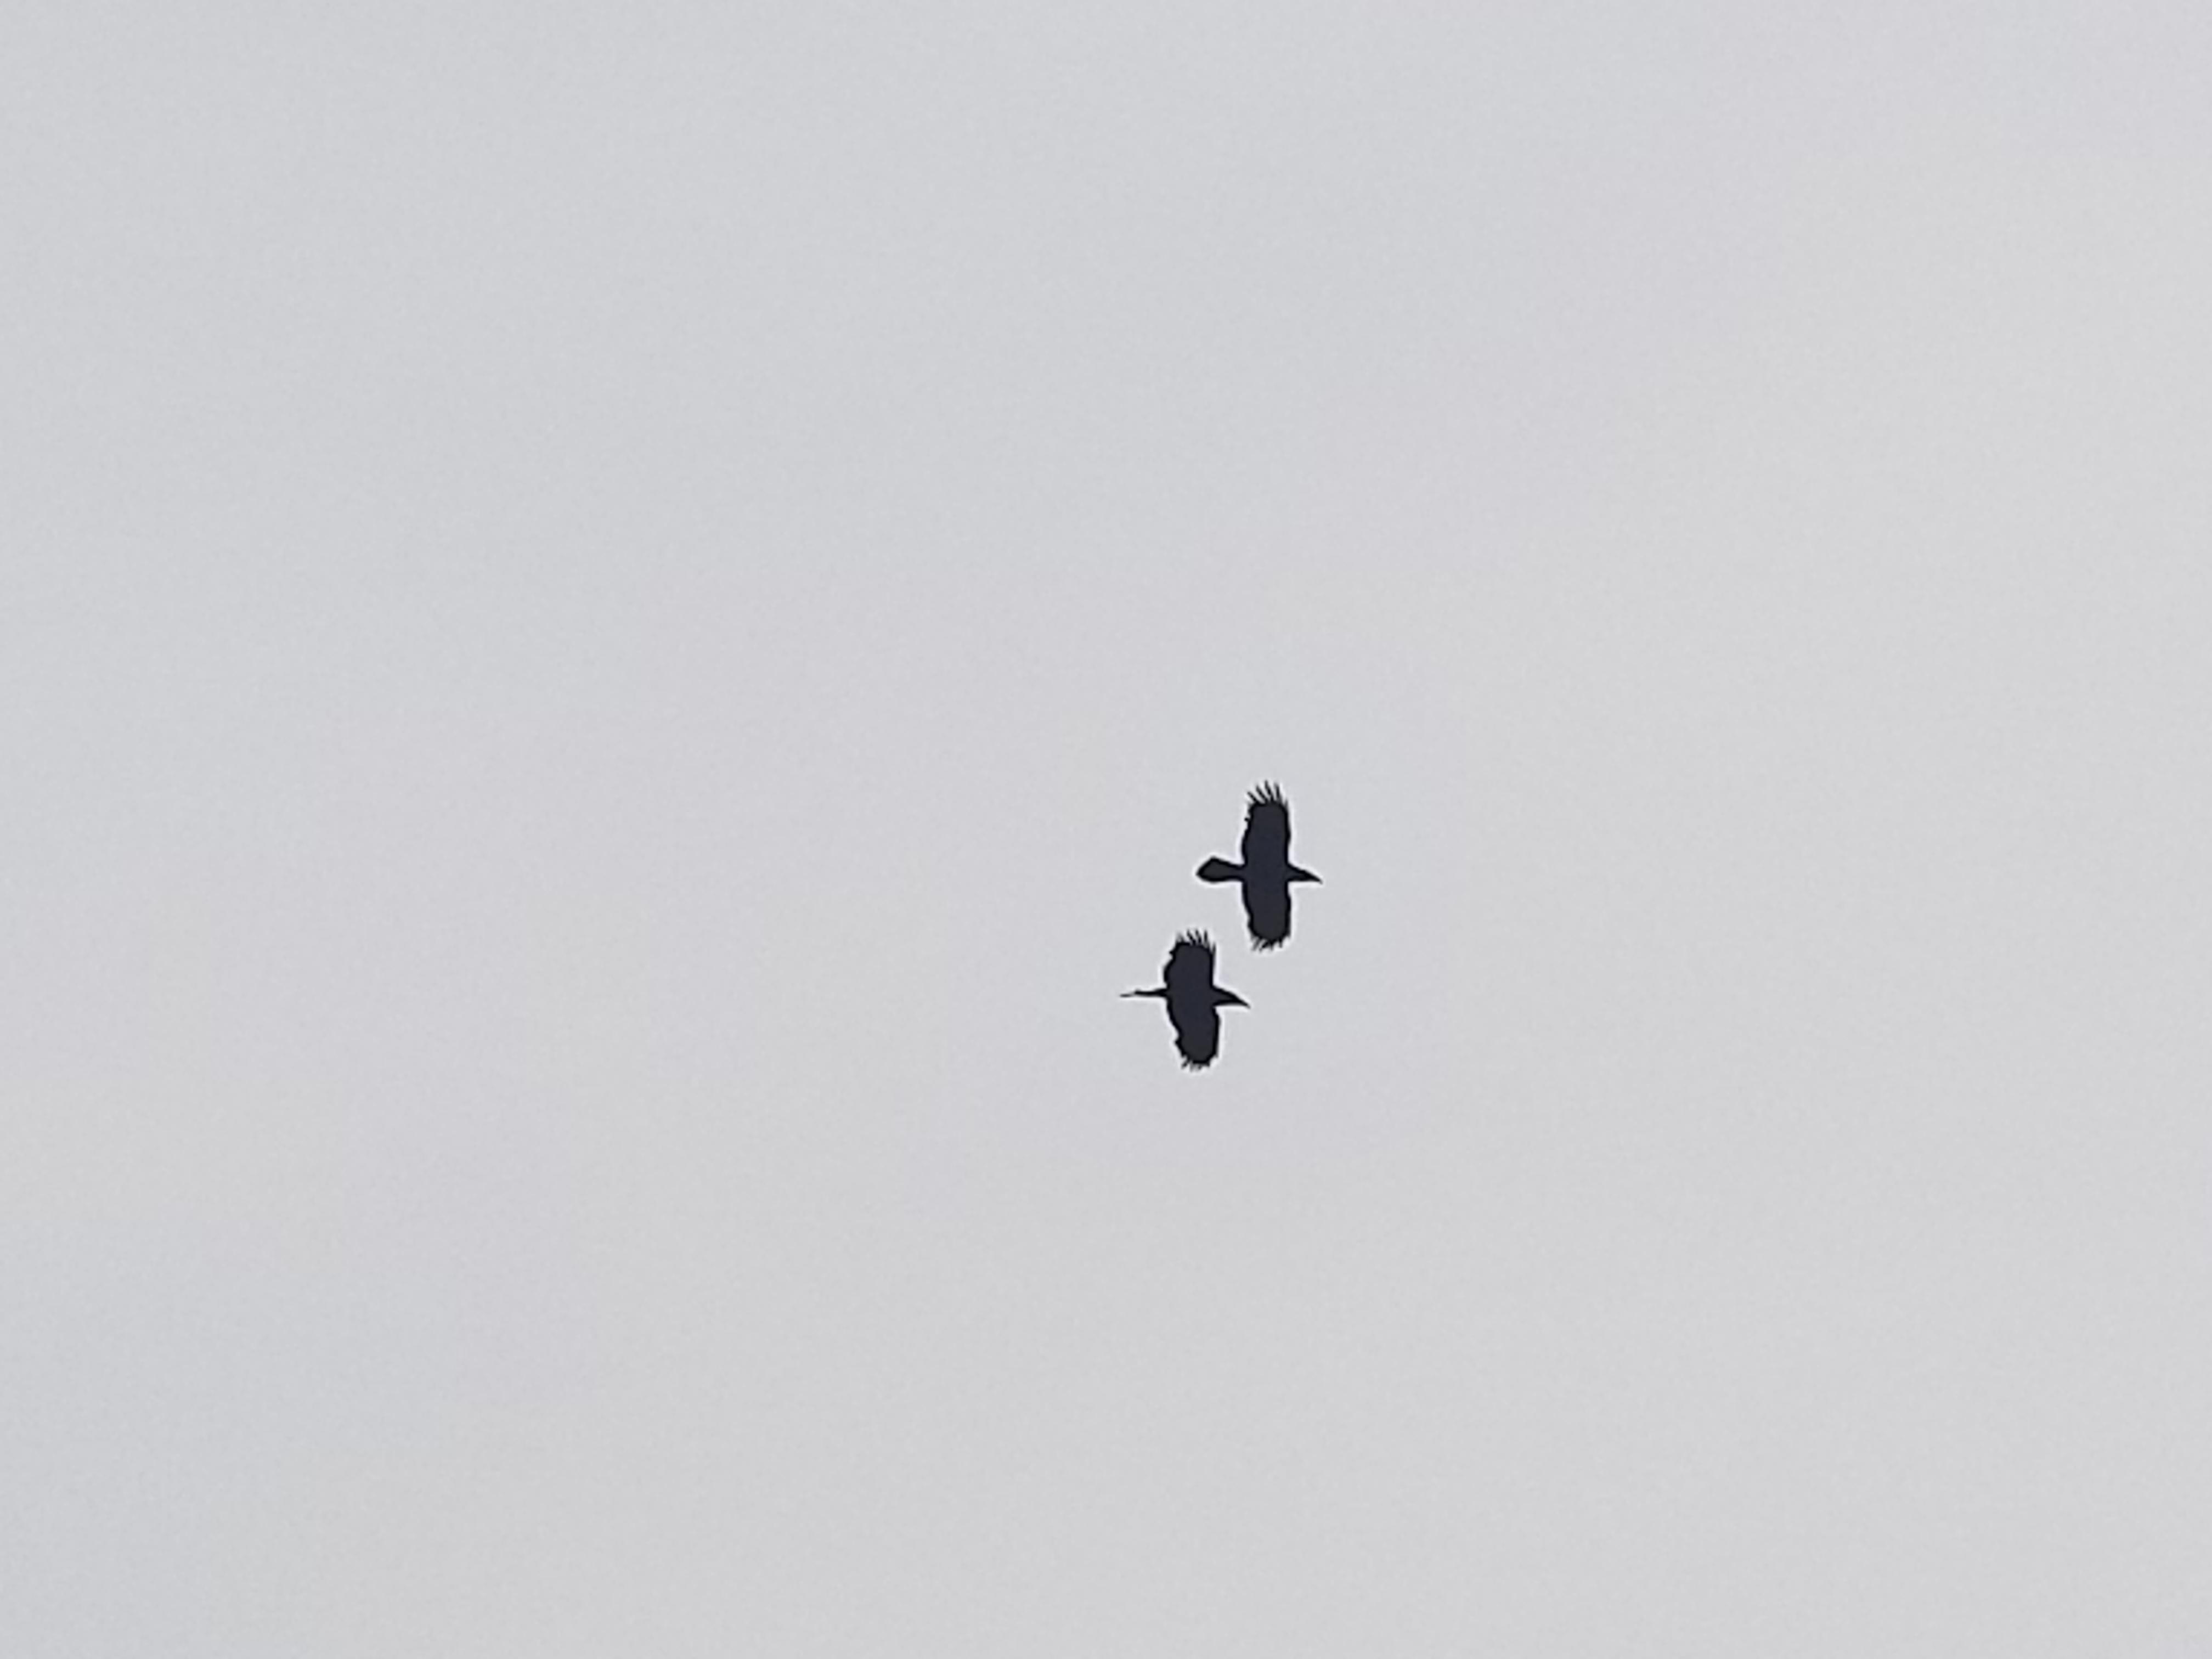 Ravens-out.jpg